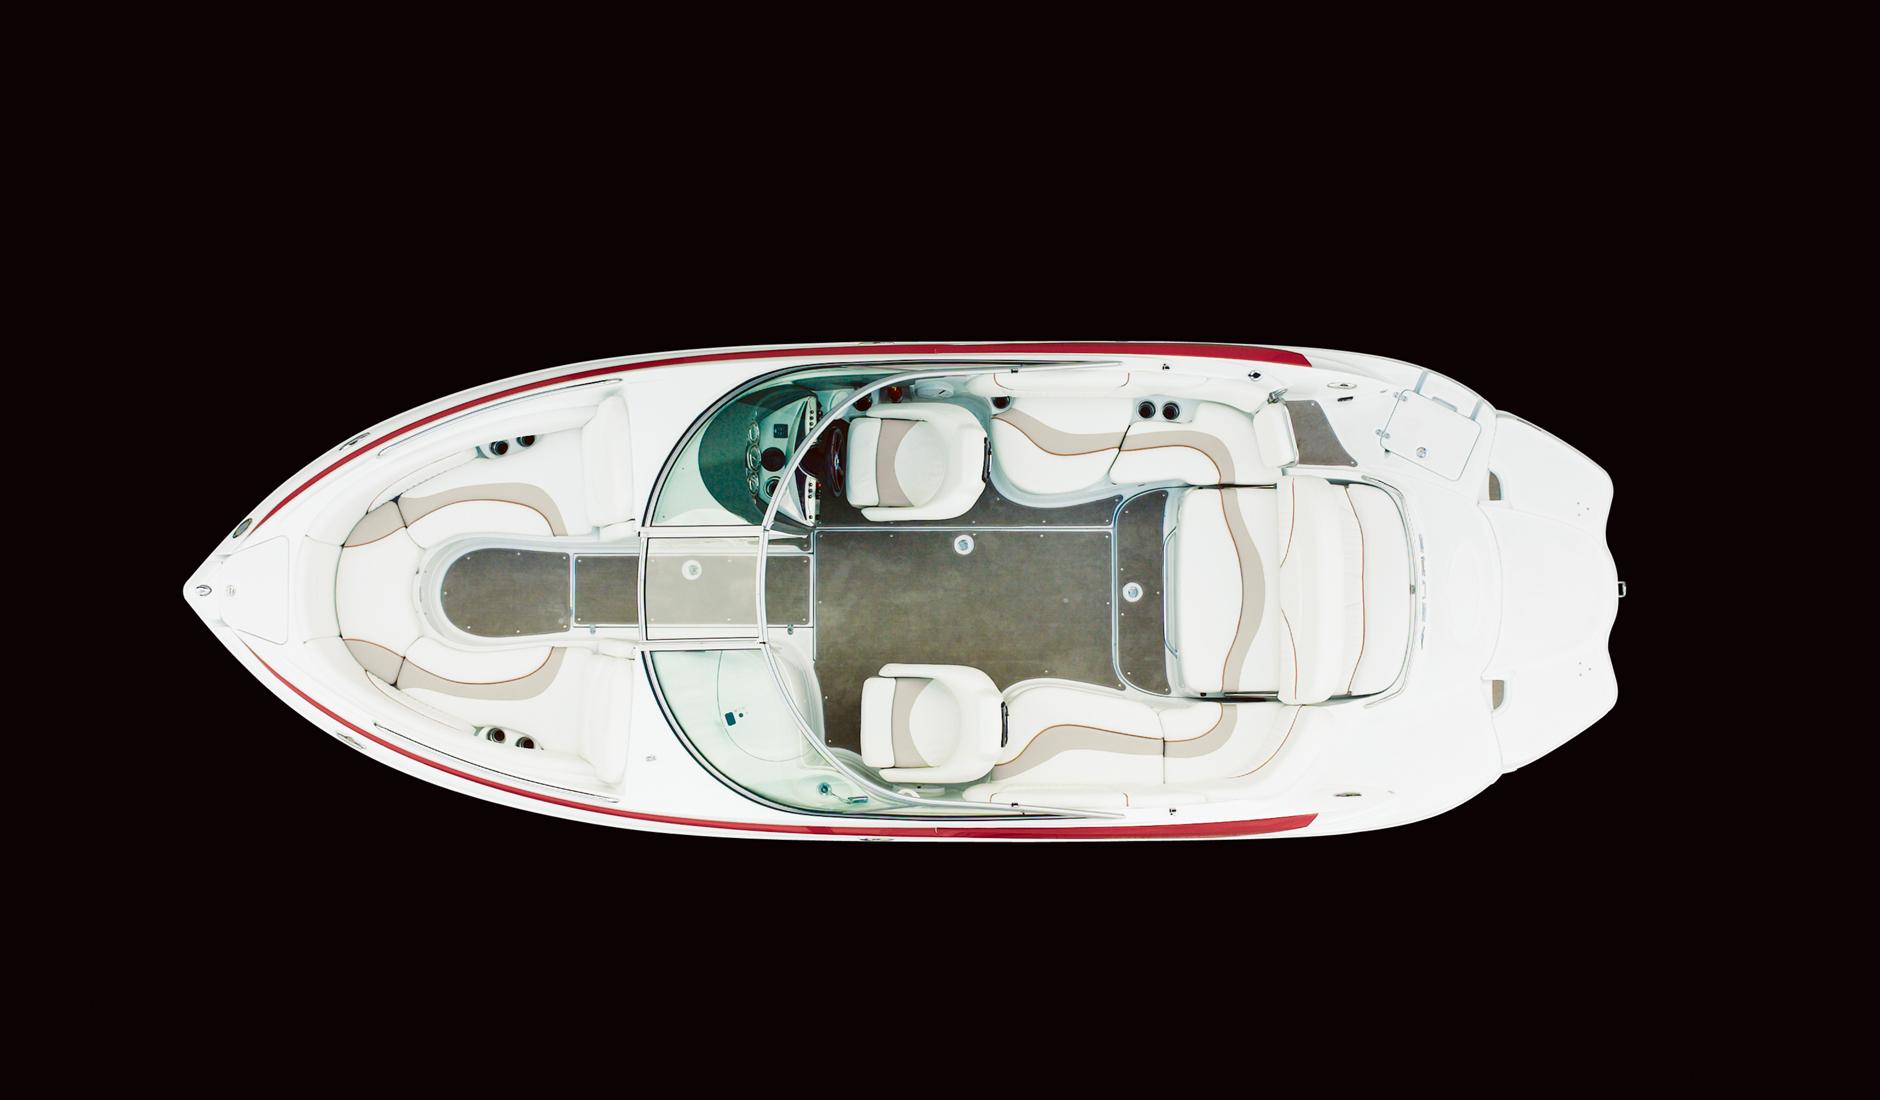 Купить Cruisers Yachts 258 Bow Rider